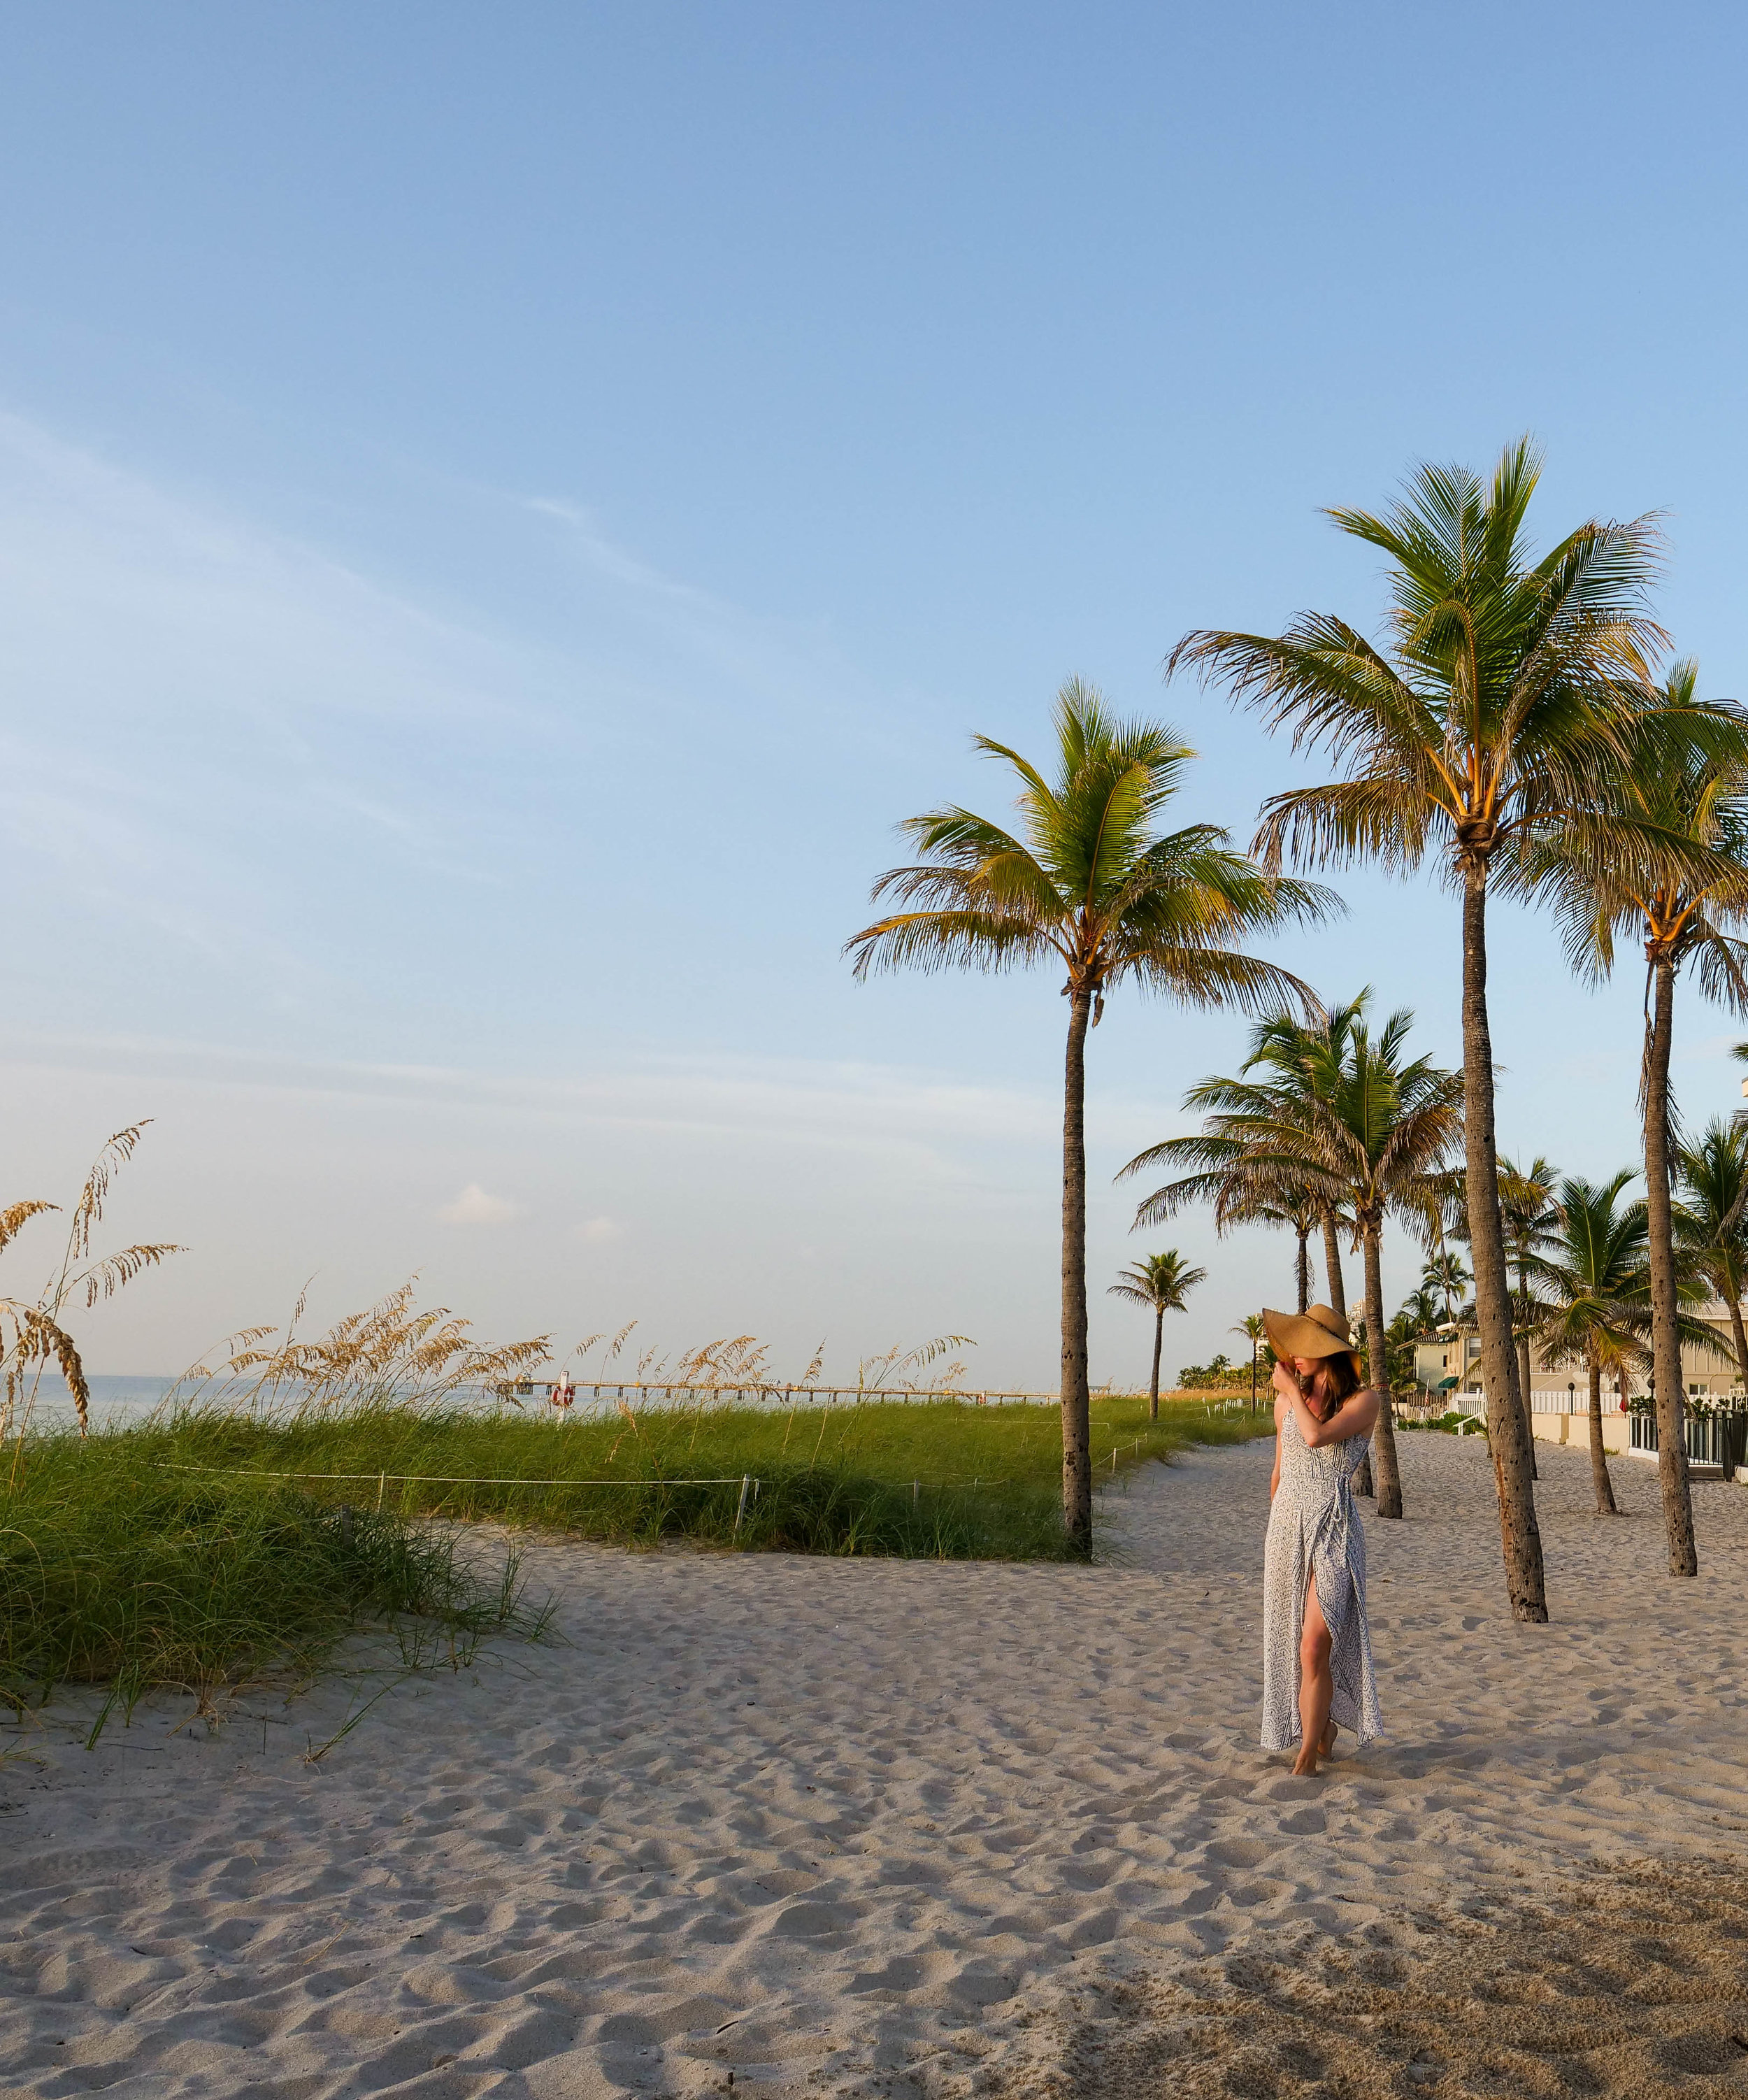 SarahFunky x Fort Lauderdale adventure-9.jpg